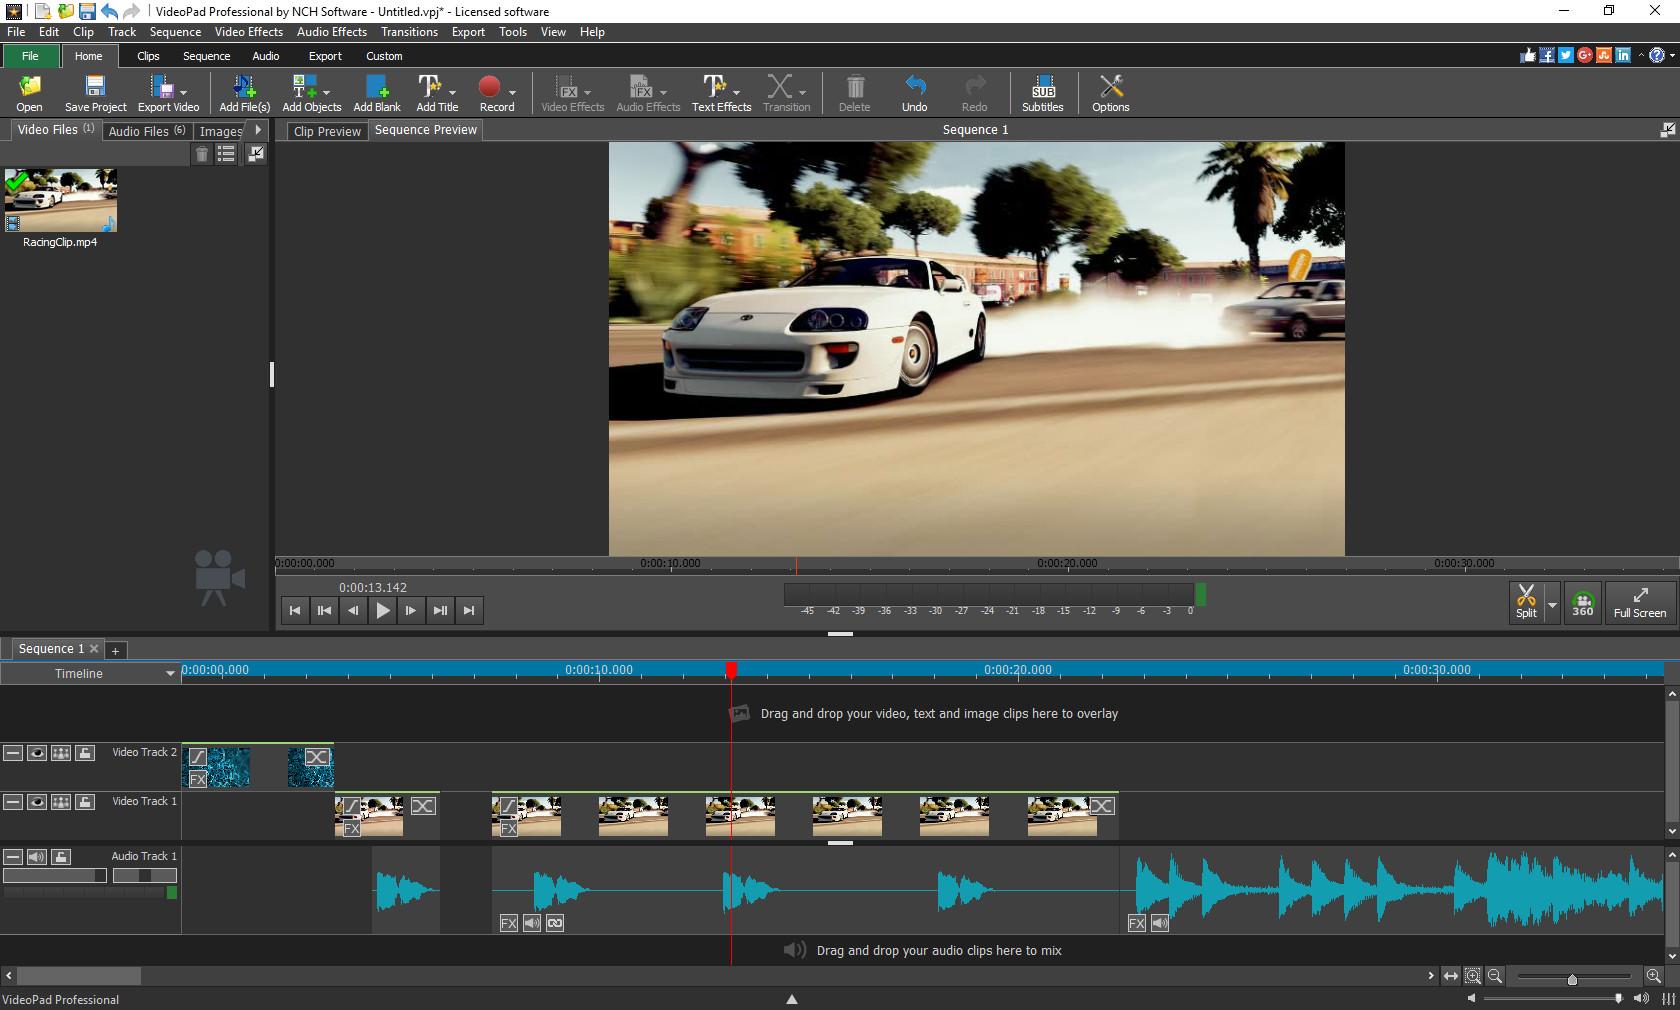 videopad video editor mac free download